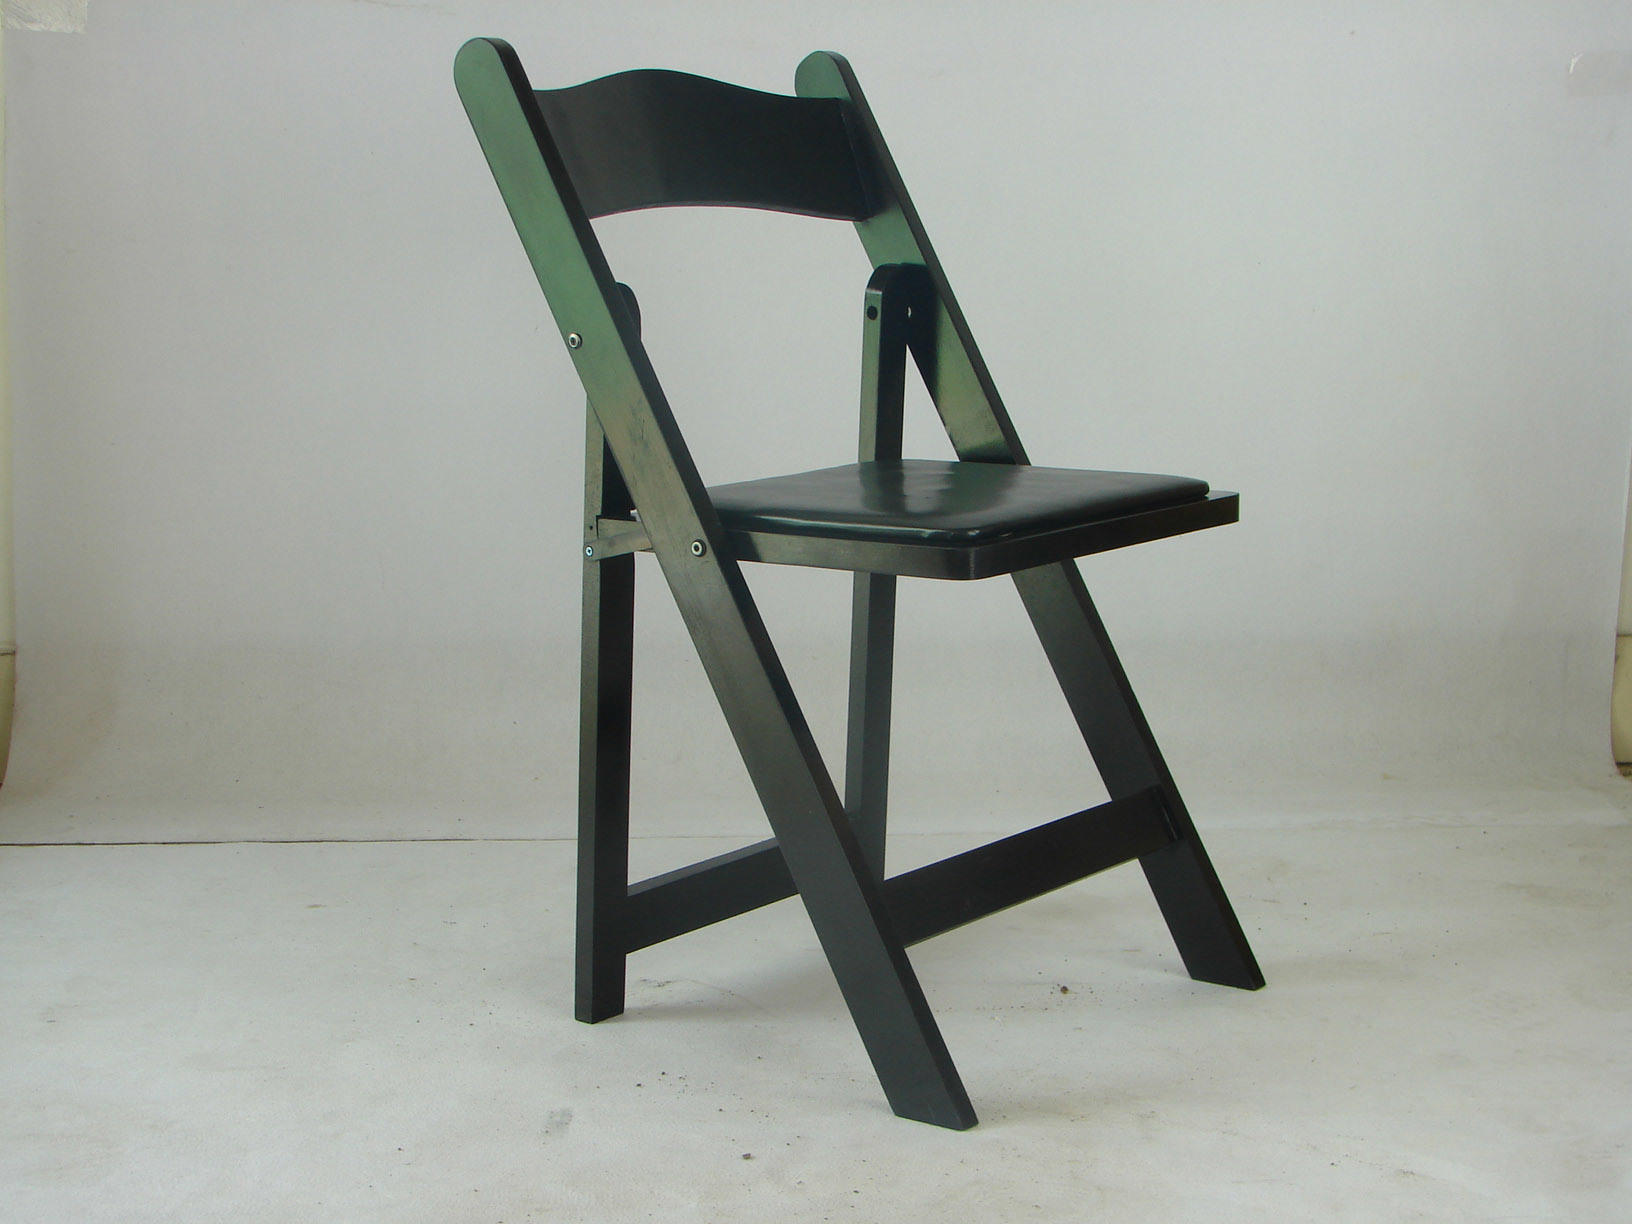 Silla de madera plegable de la silla de jard n de la silla for Sillas plegables jardin